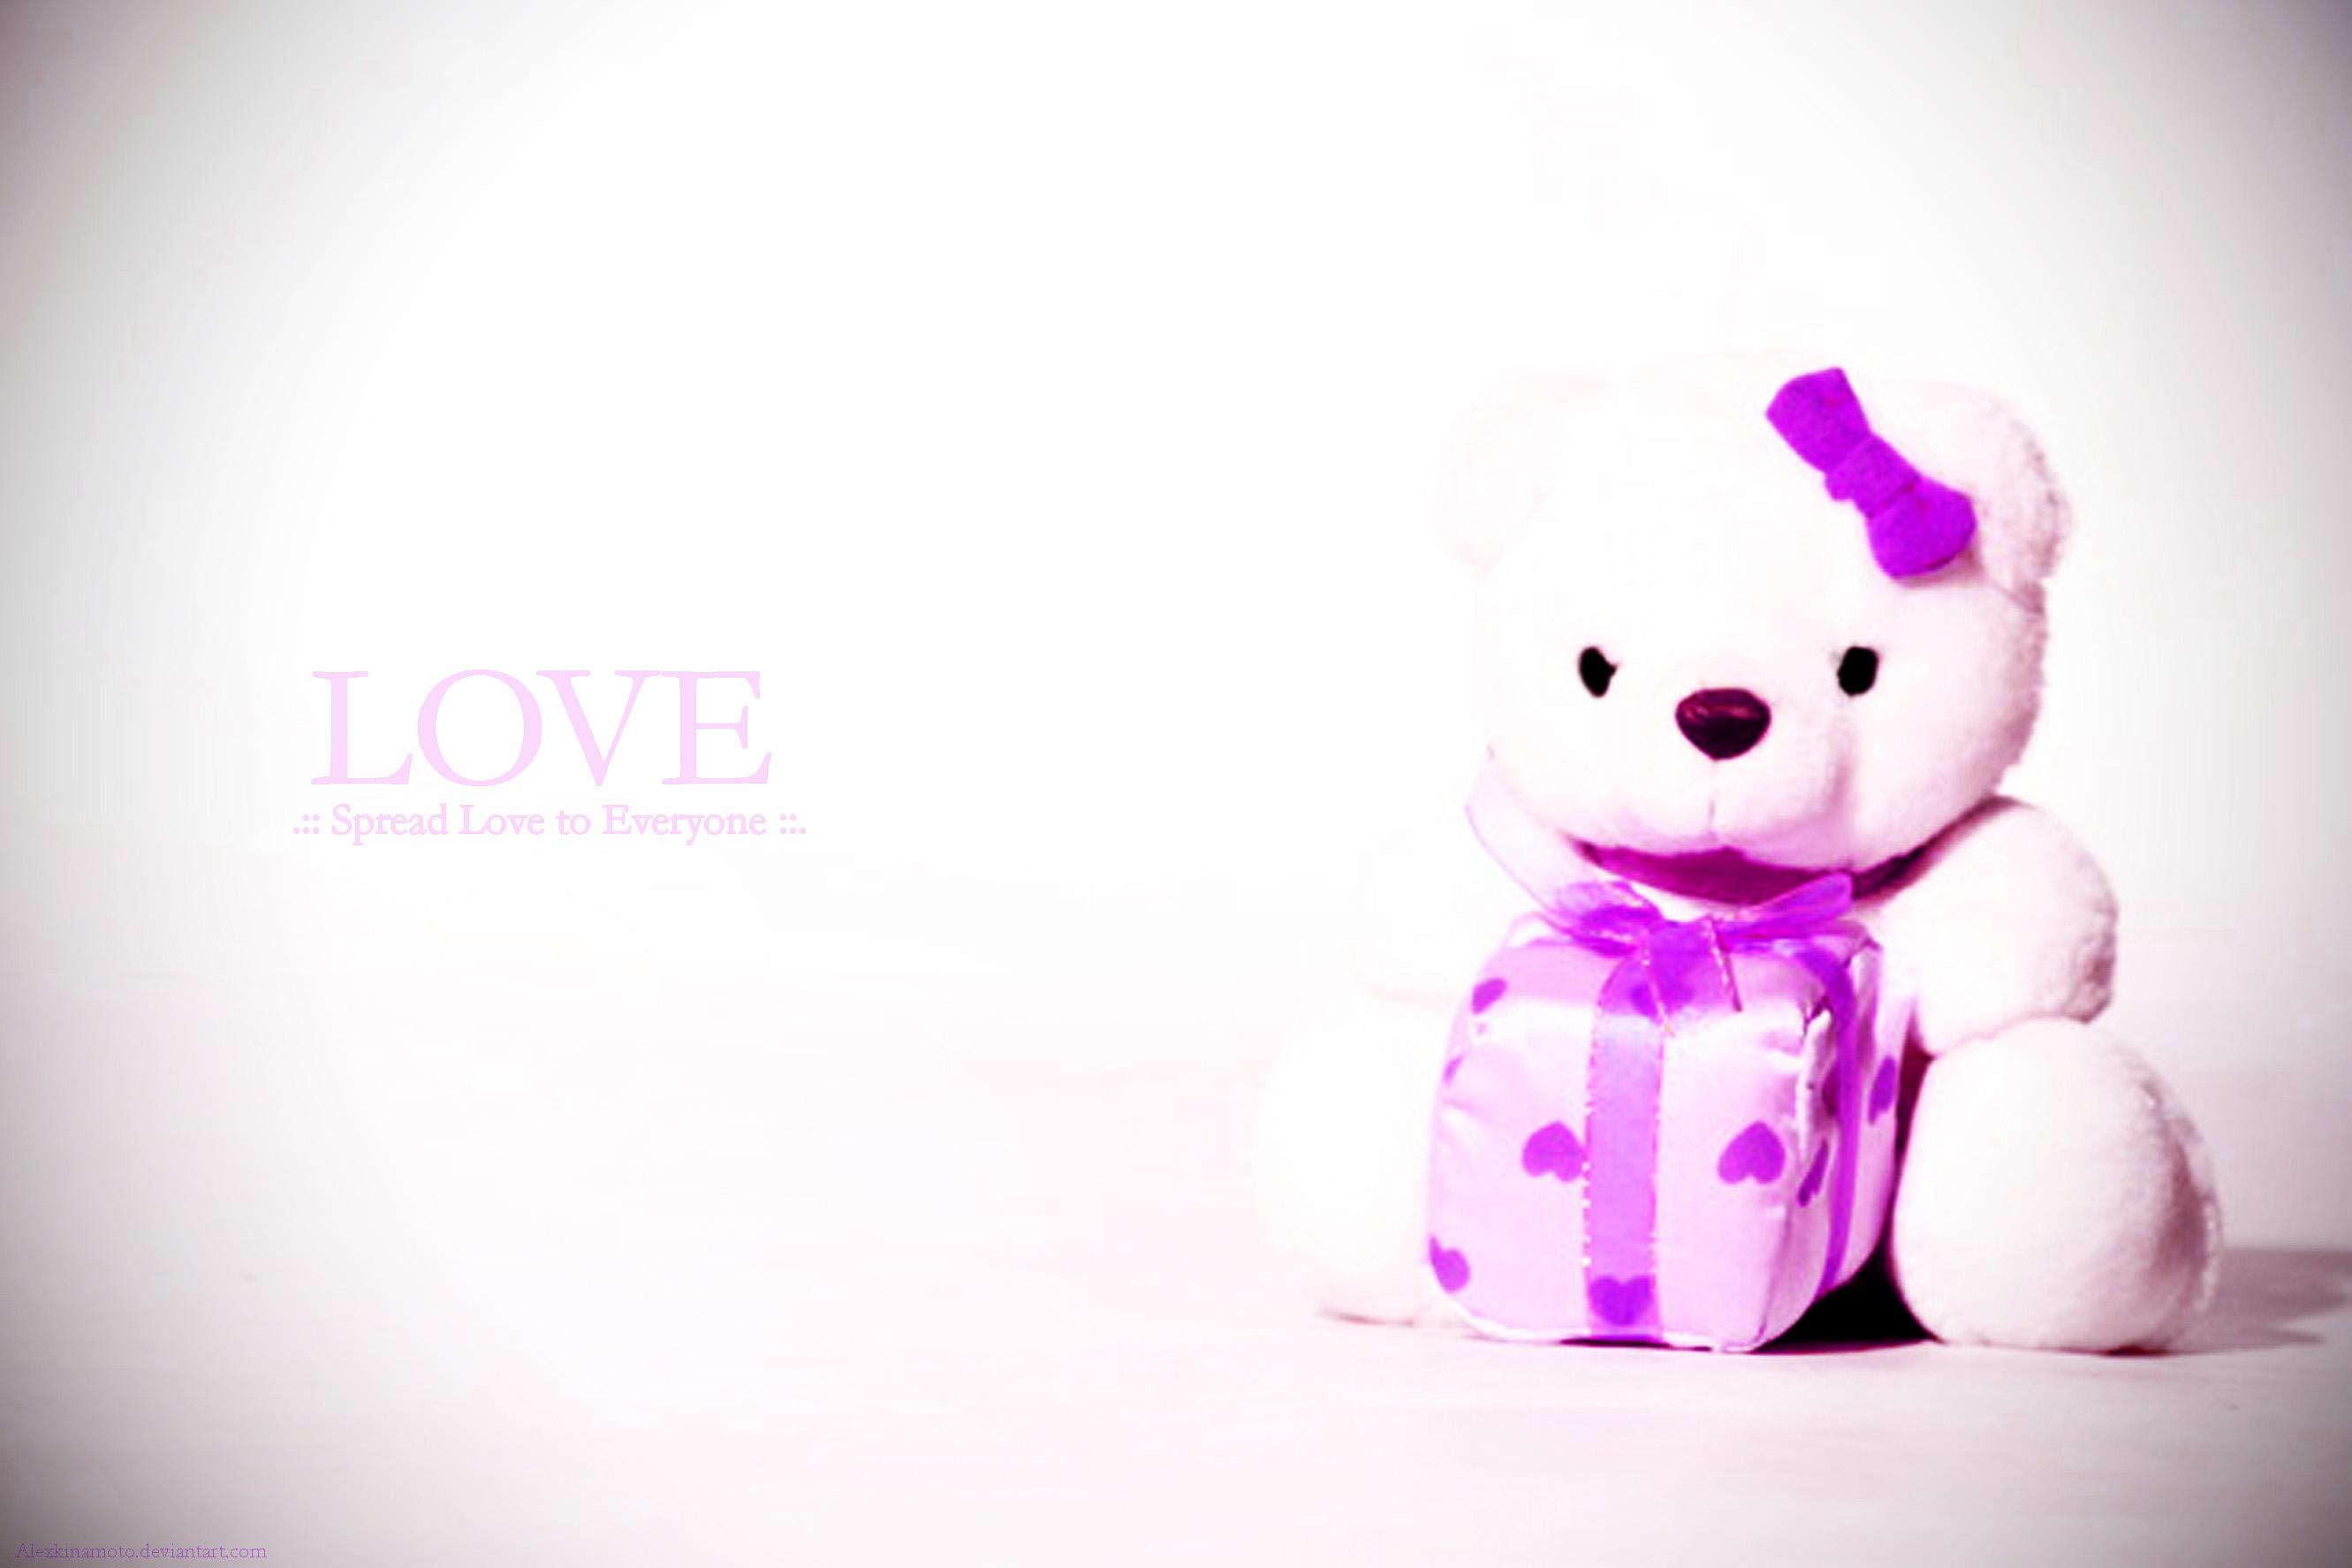 Pics Photos   Cute Teddy Bear Images Hd Wallpaper We 2662x1775